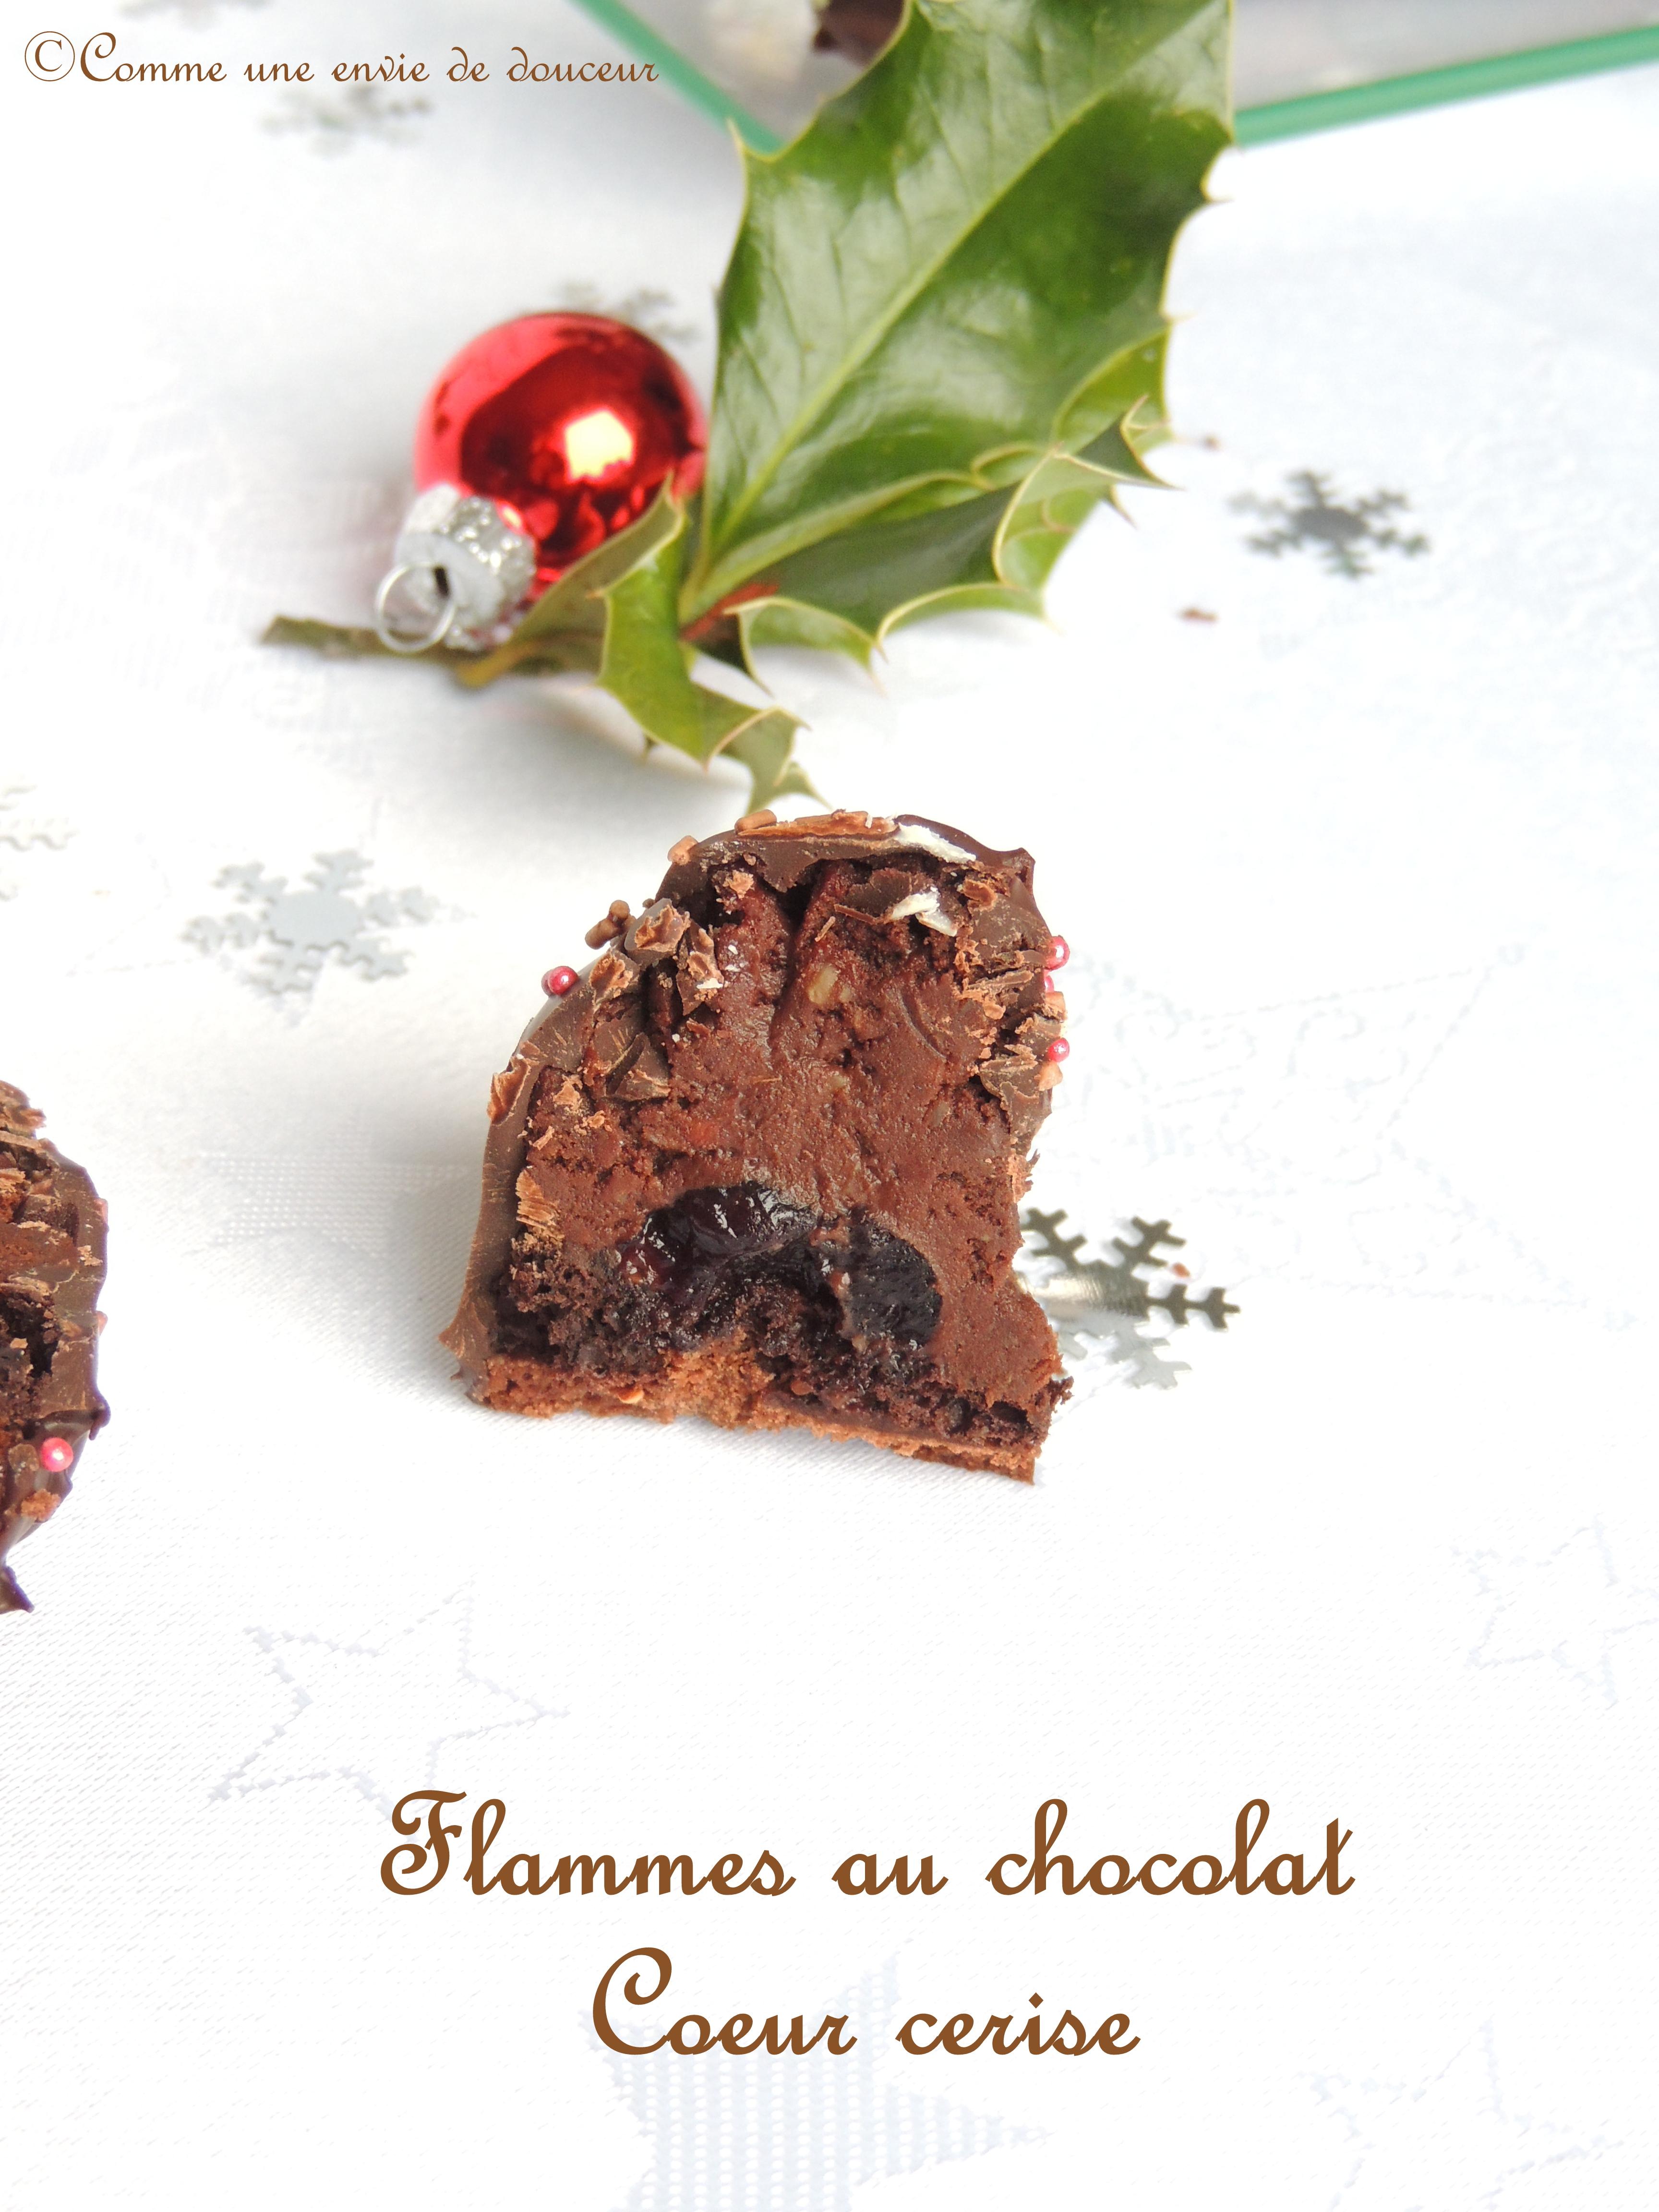 Flammes au chocolat cœur cerise amarena- Chocolate & cherry flames